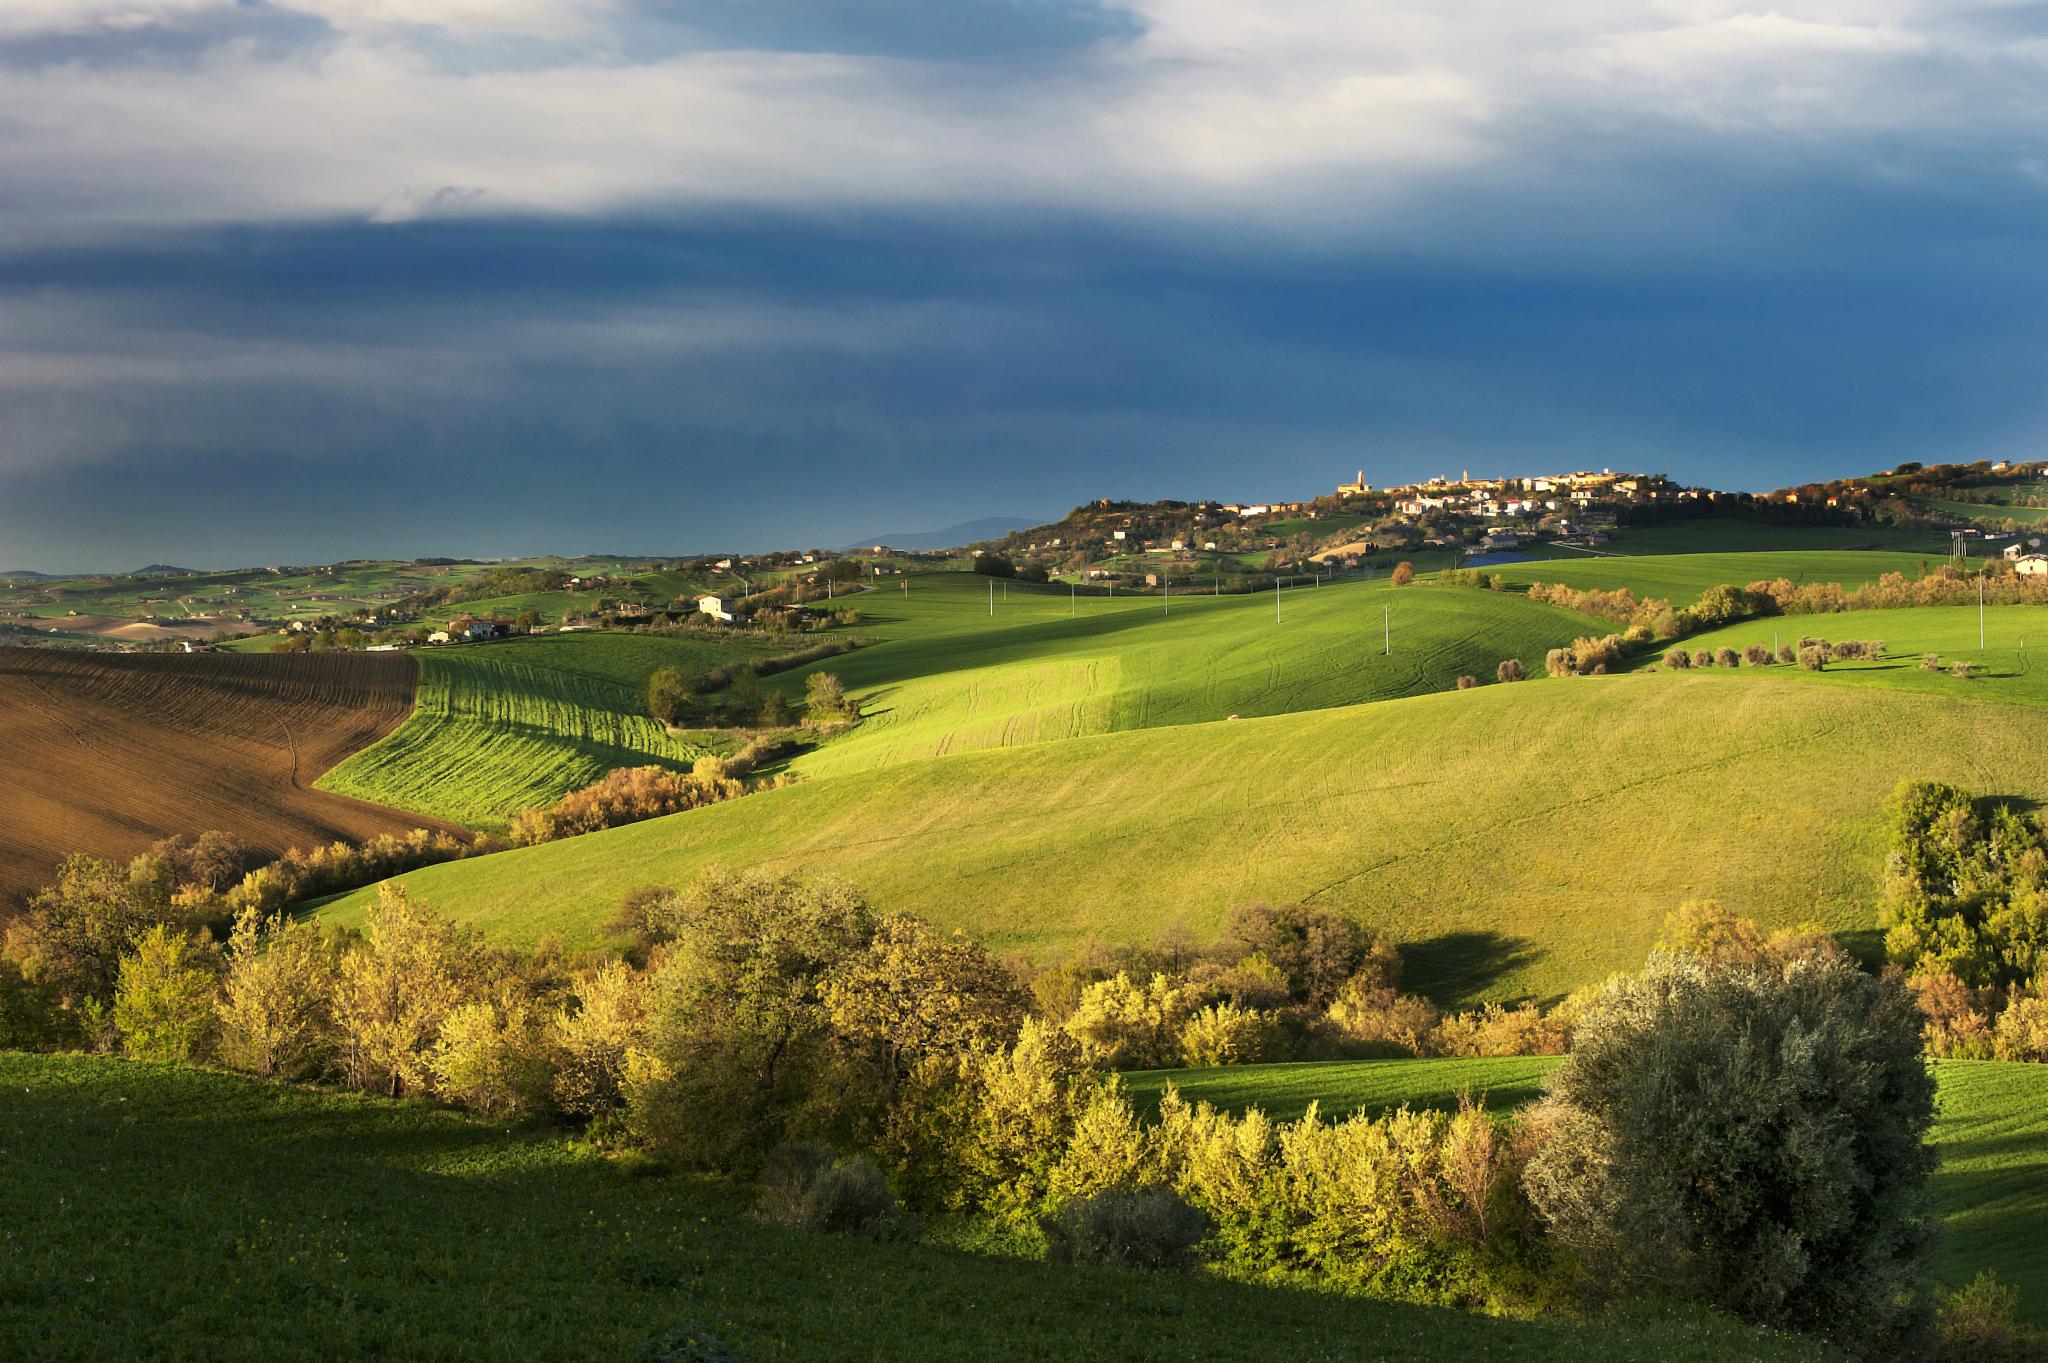 Toscana_Italy_красоты_Италии_Тоскана2